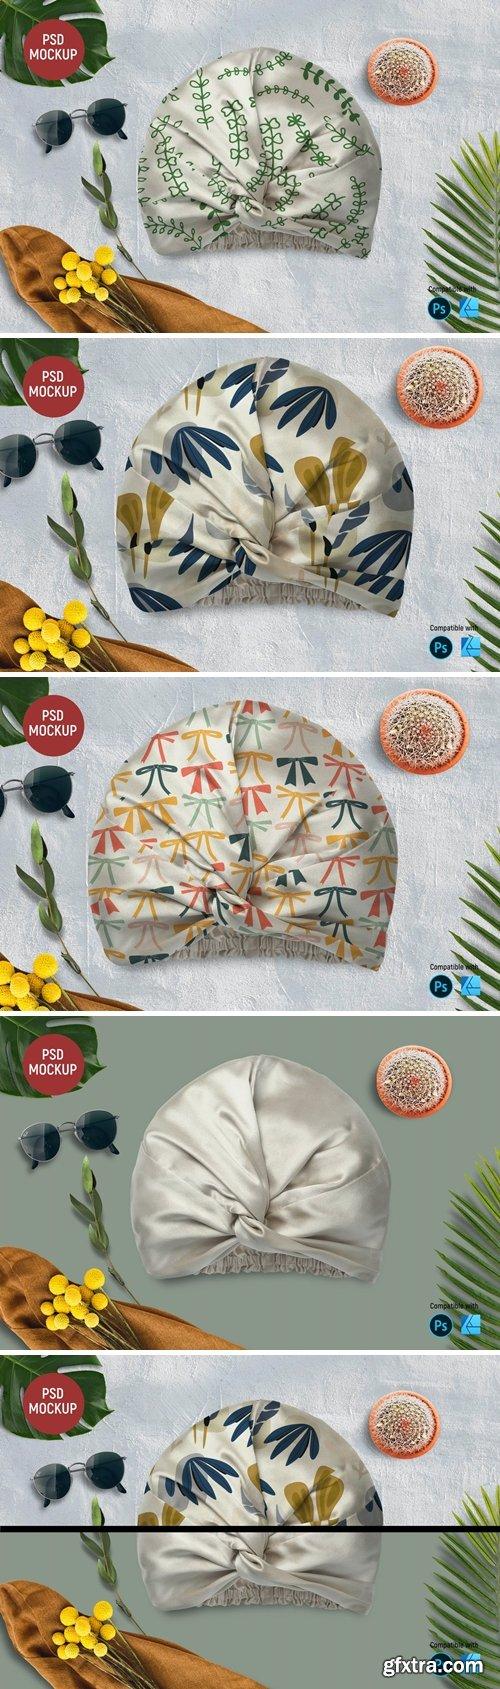 Silk Turban Mockup